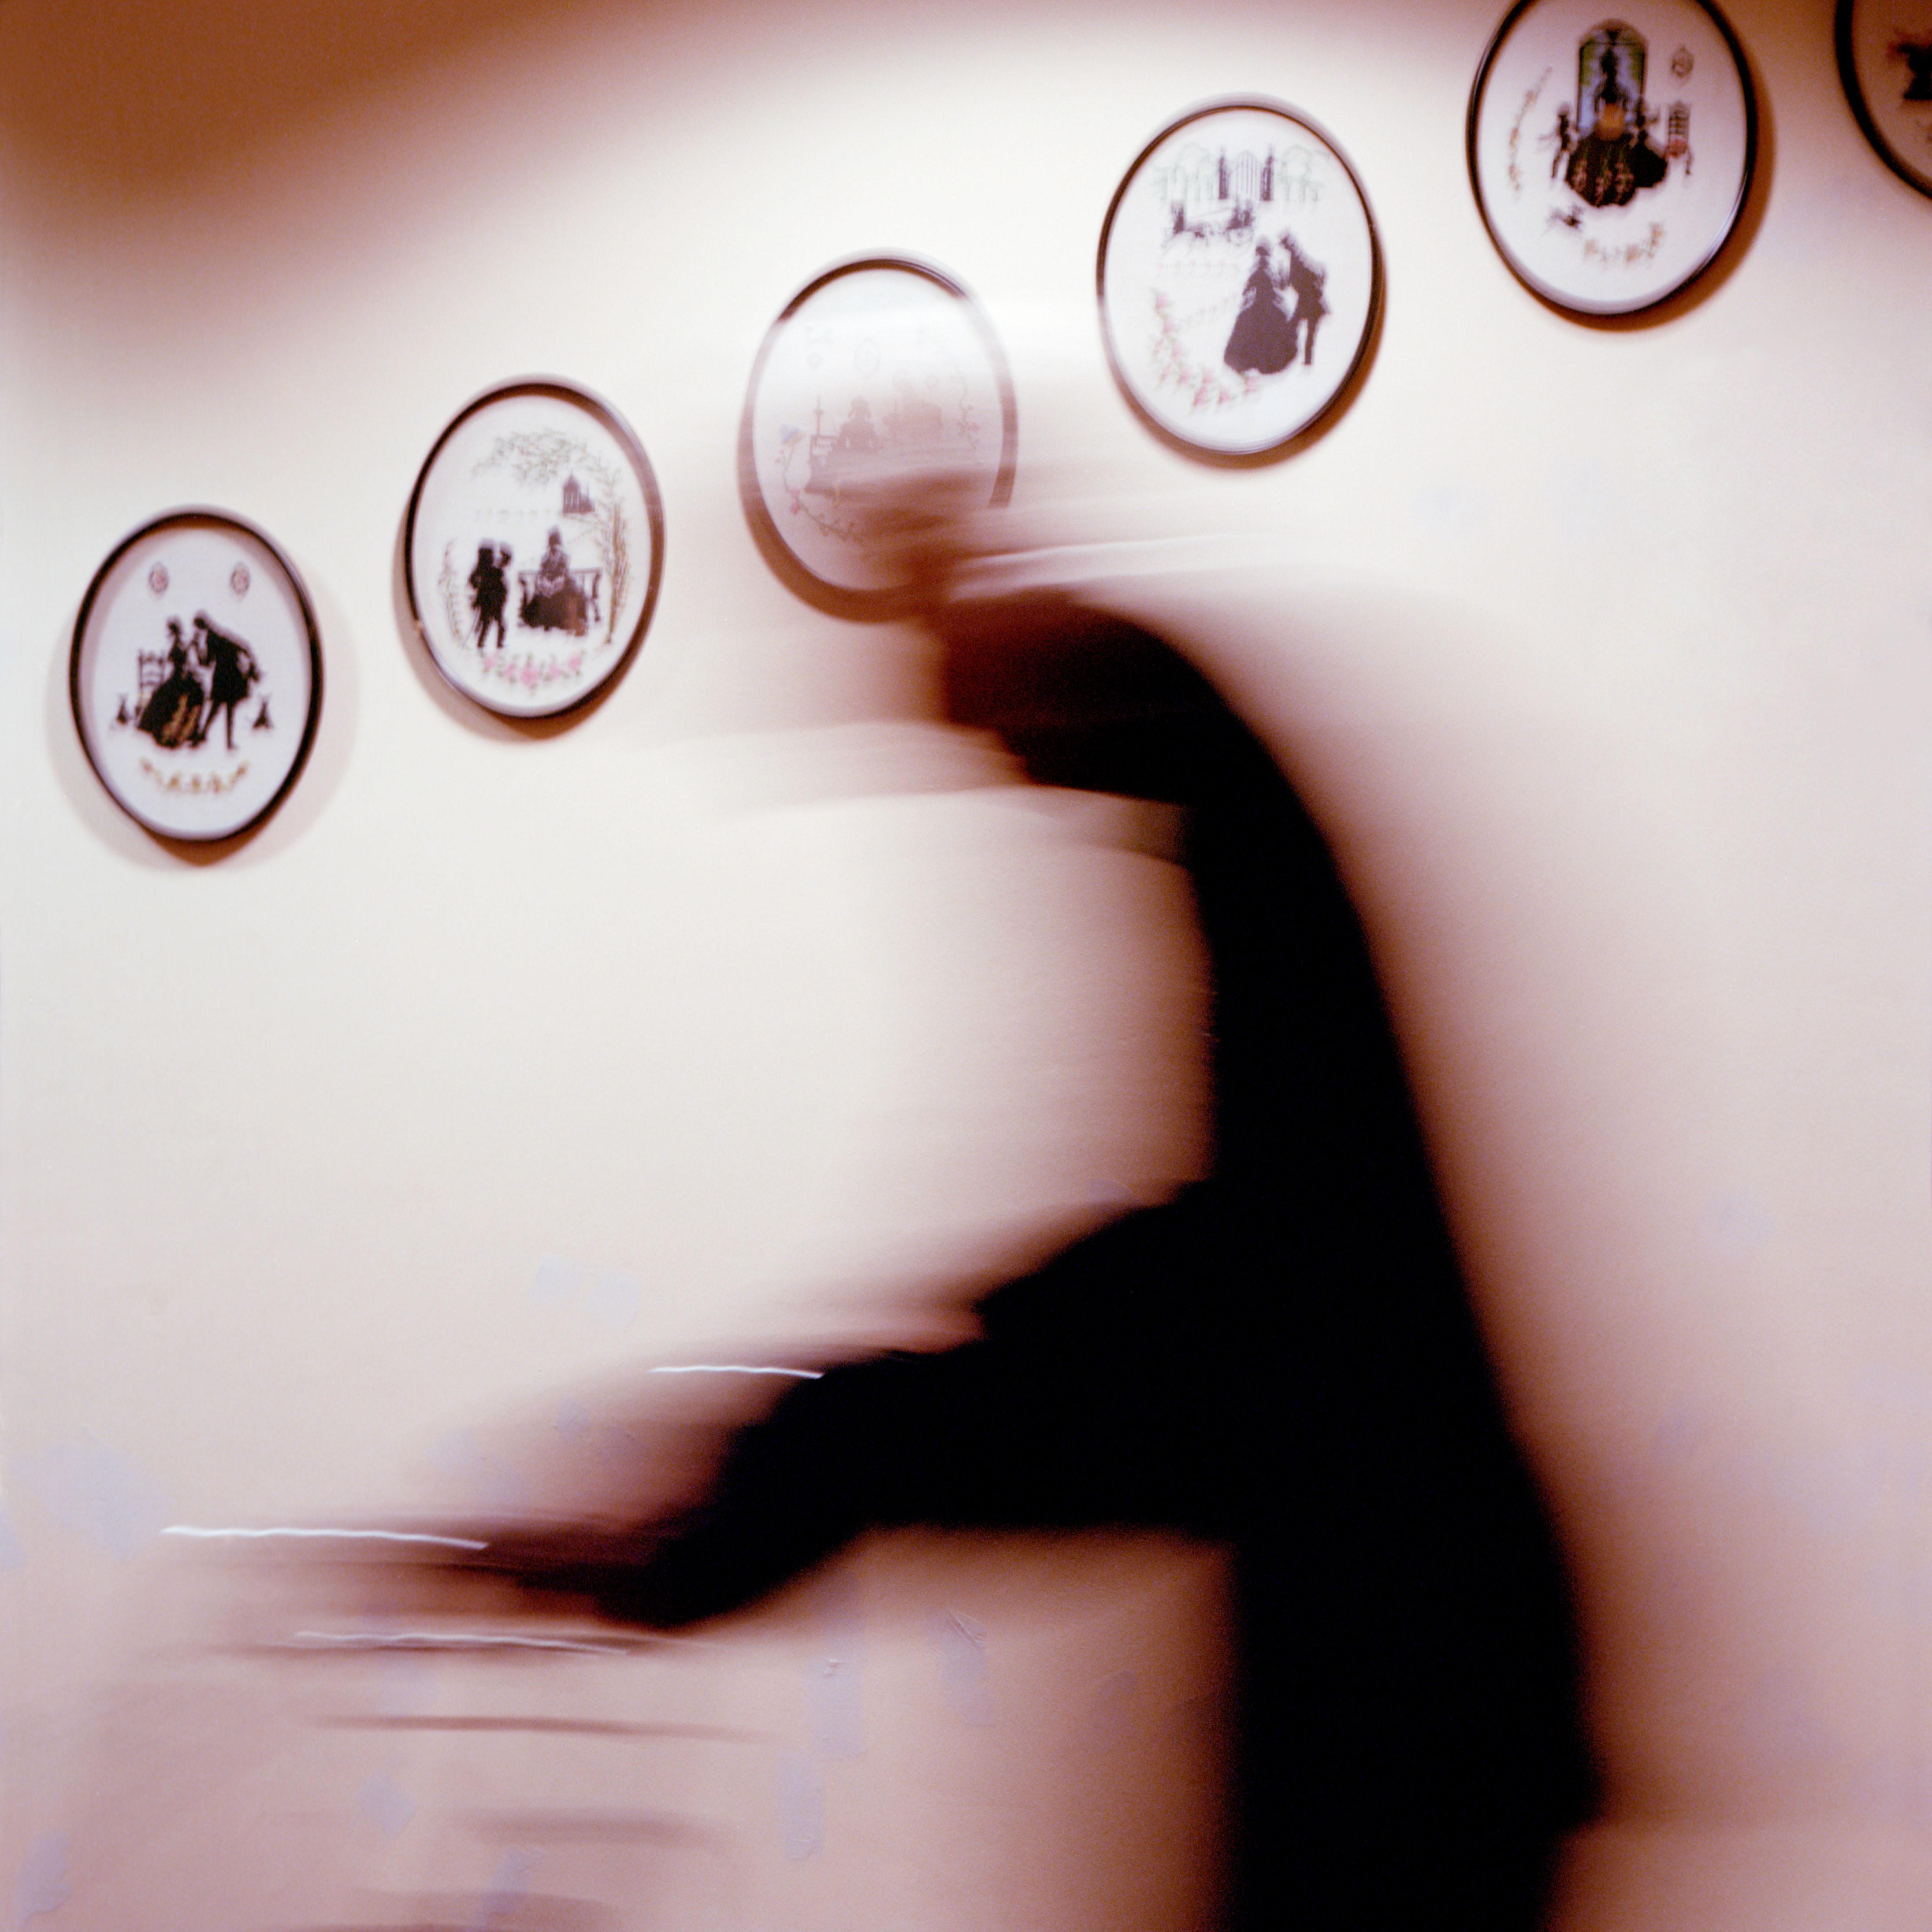 Dementia friendly pictures by photographer Jeroen Snel (Dutch)